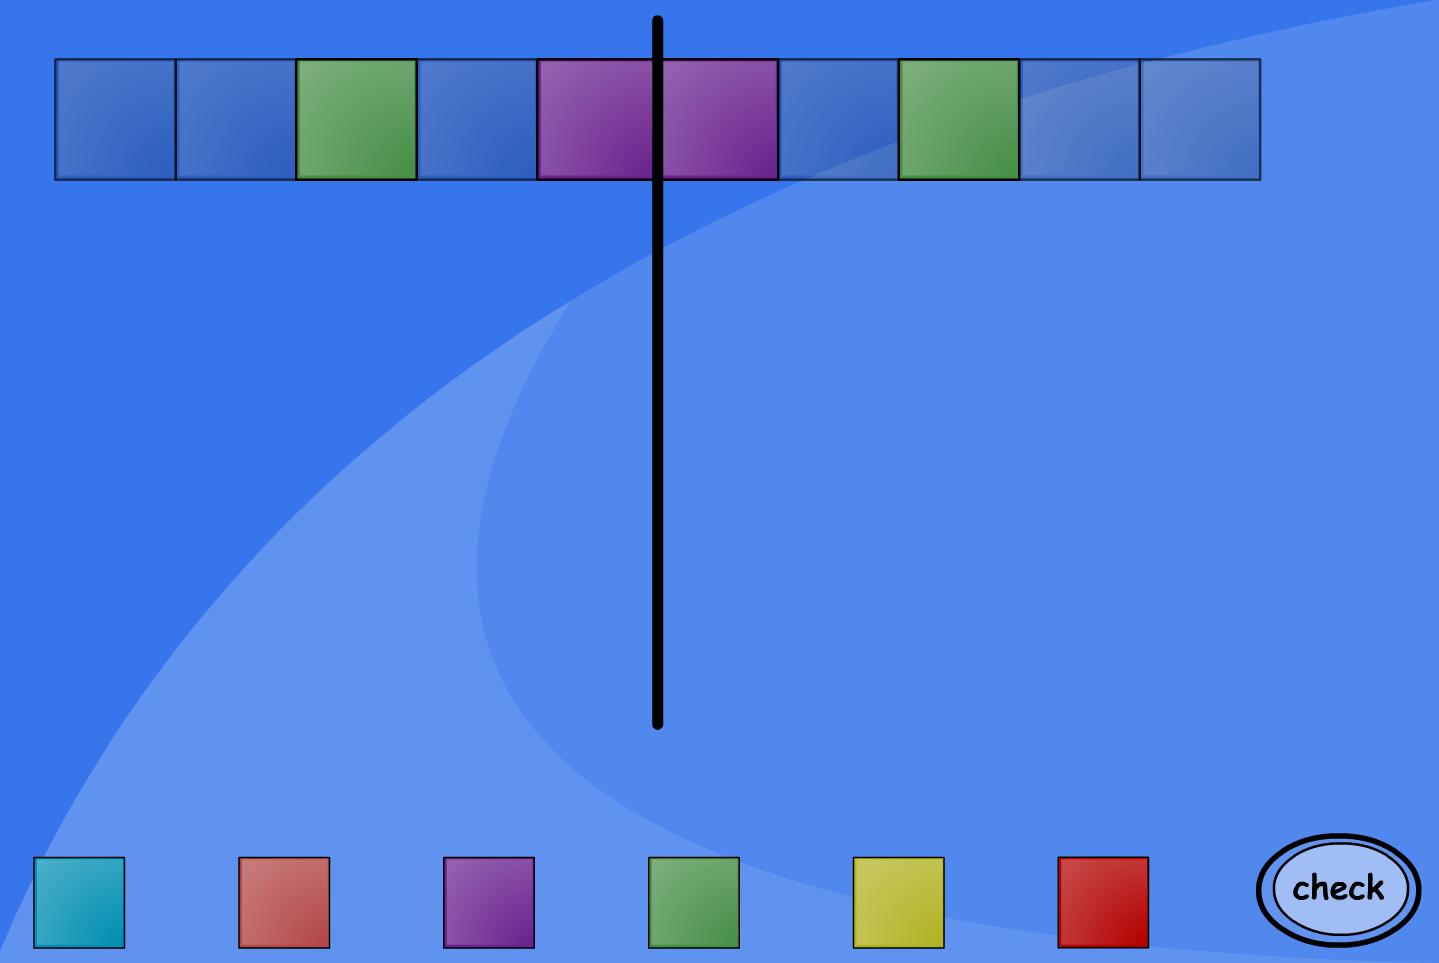 Symmetrical Patterns Interactive Activity